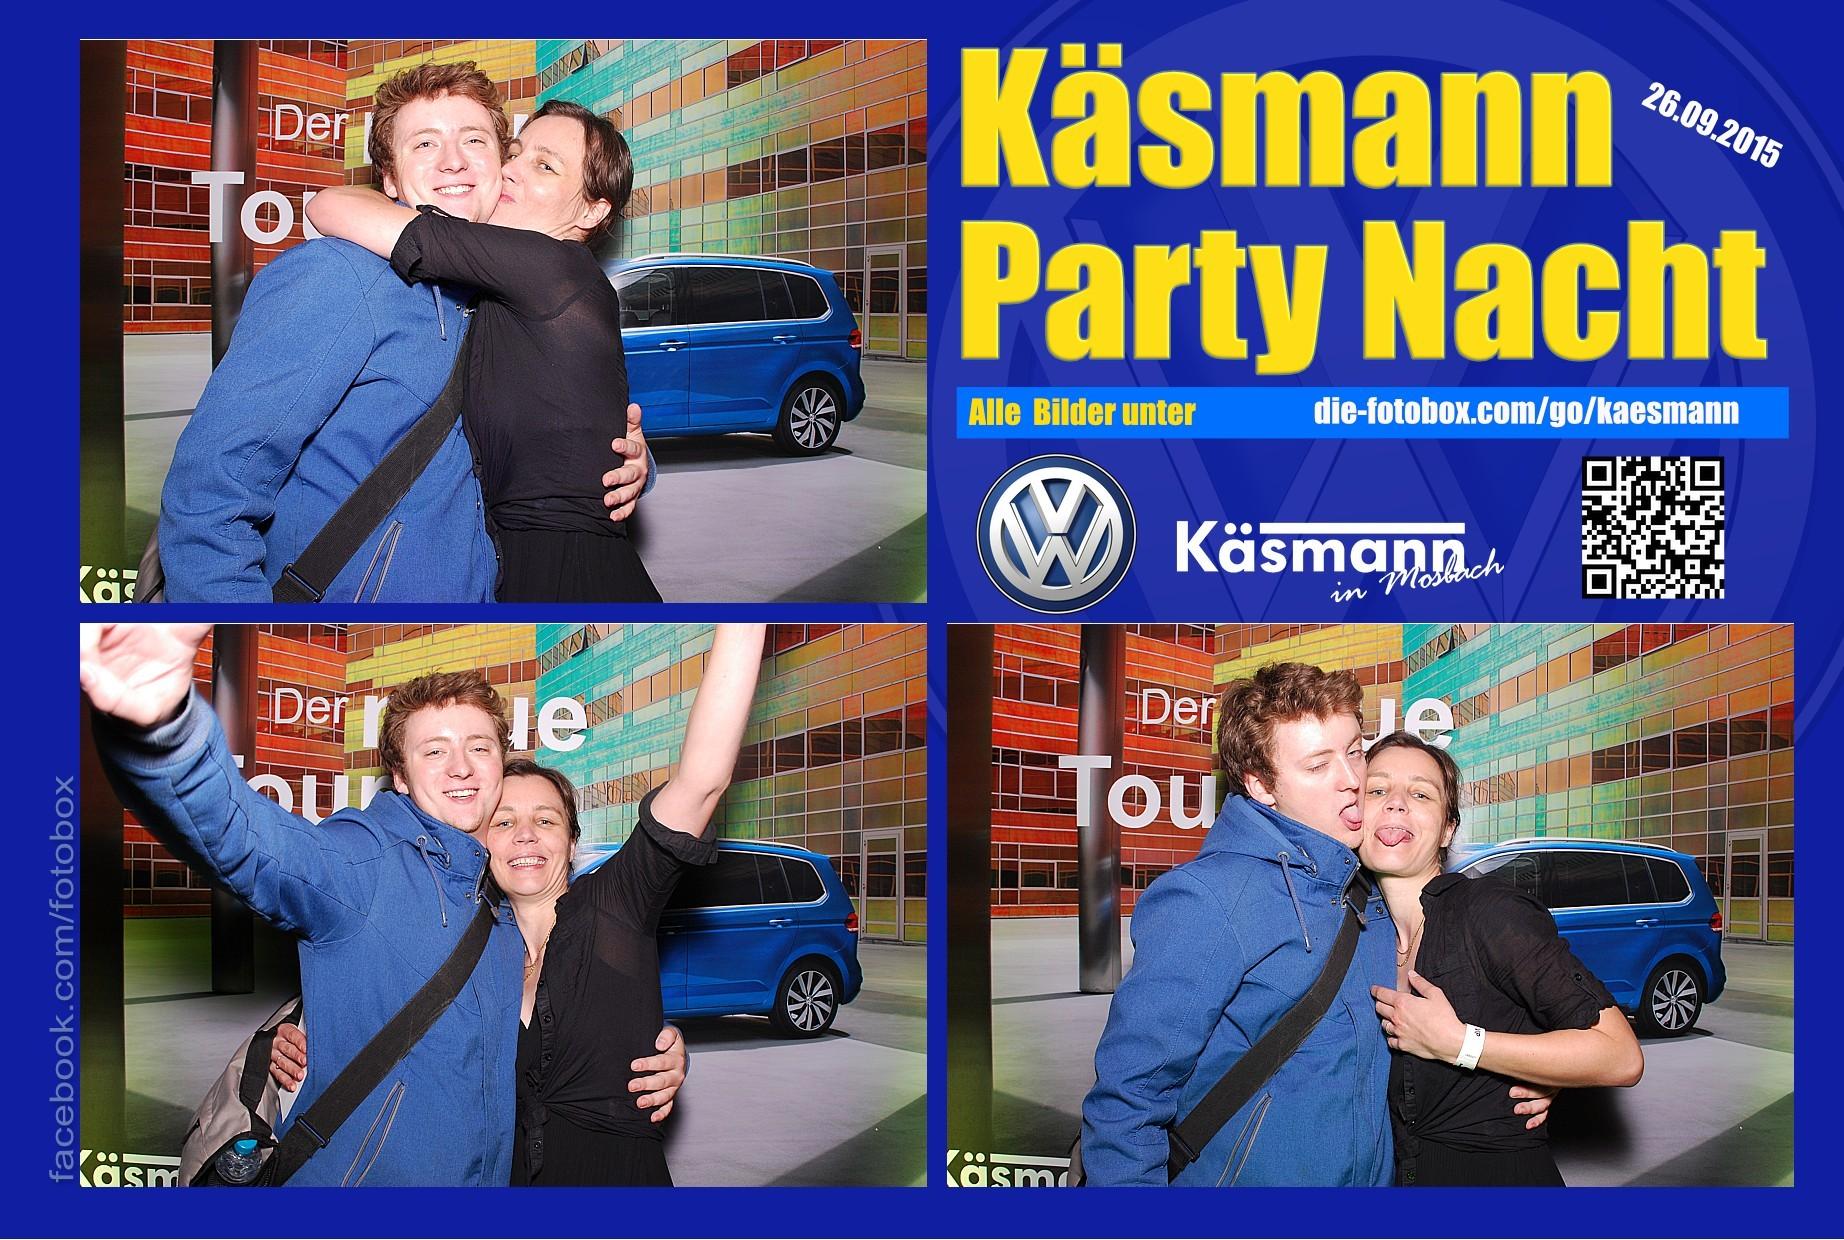 Käsmannparty 2015 - www.die-fotobox.com 01308